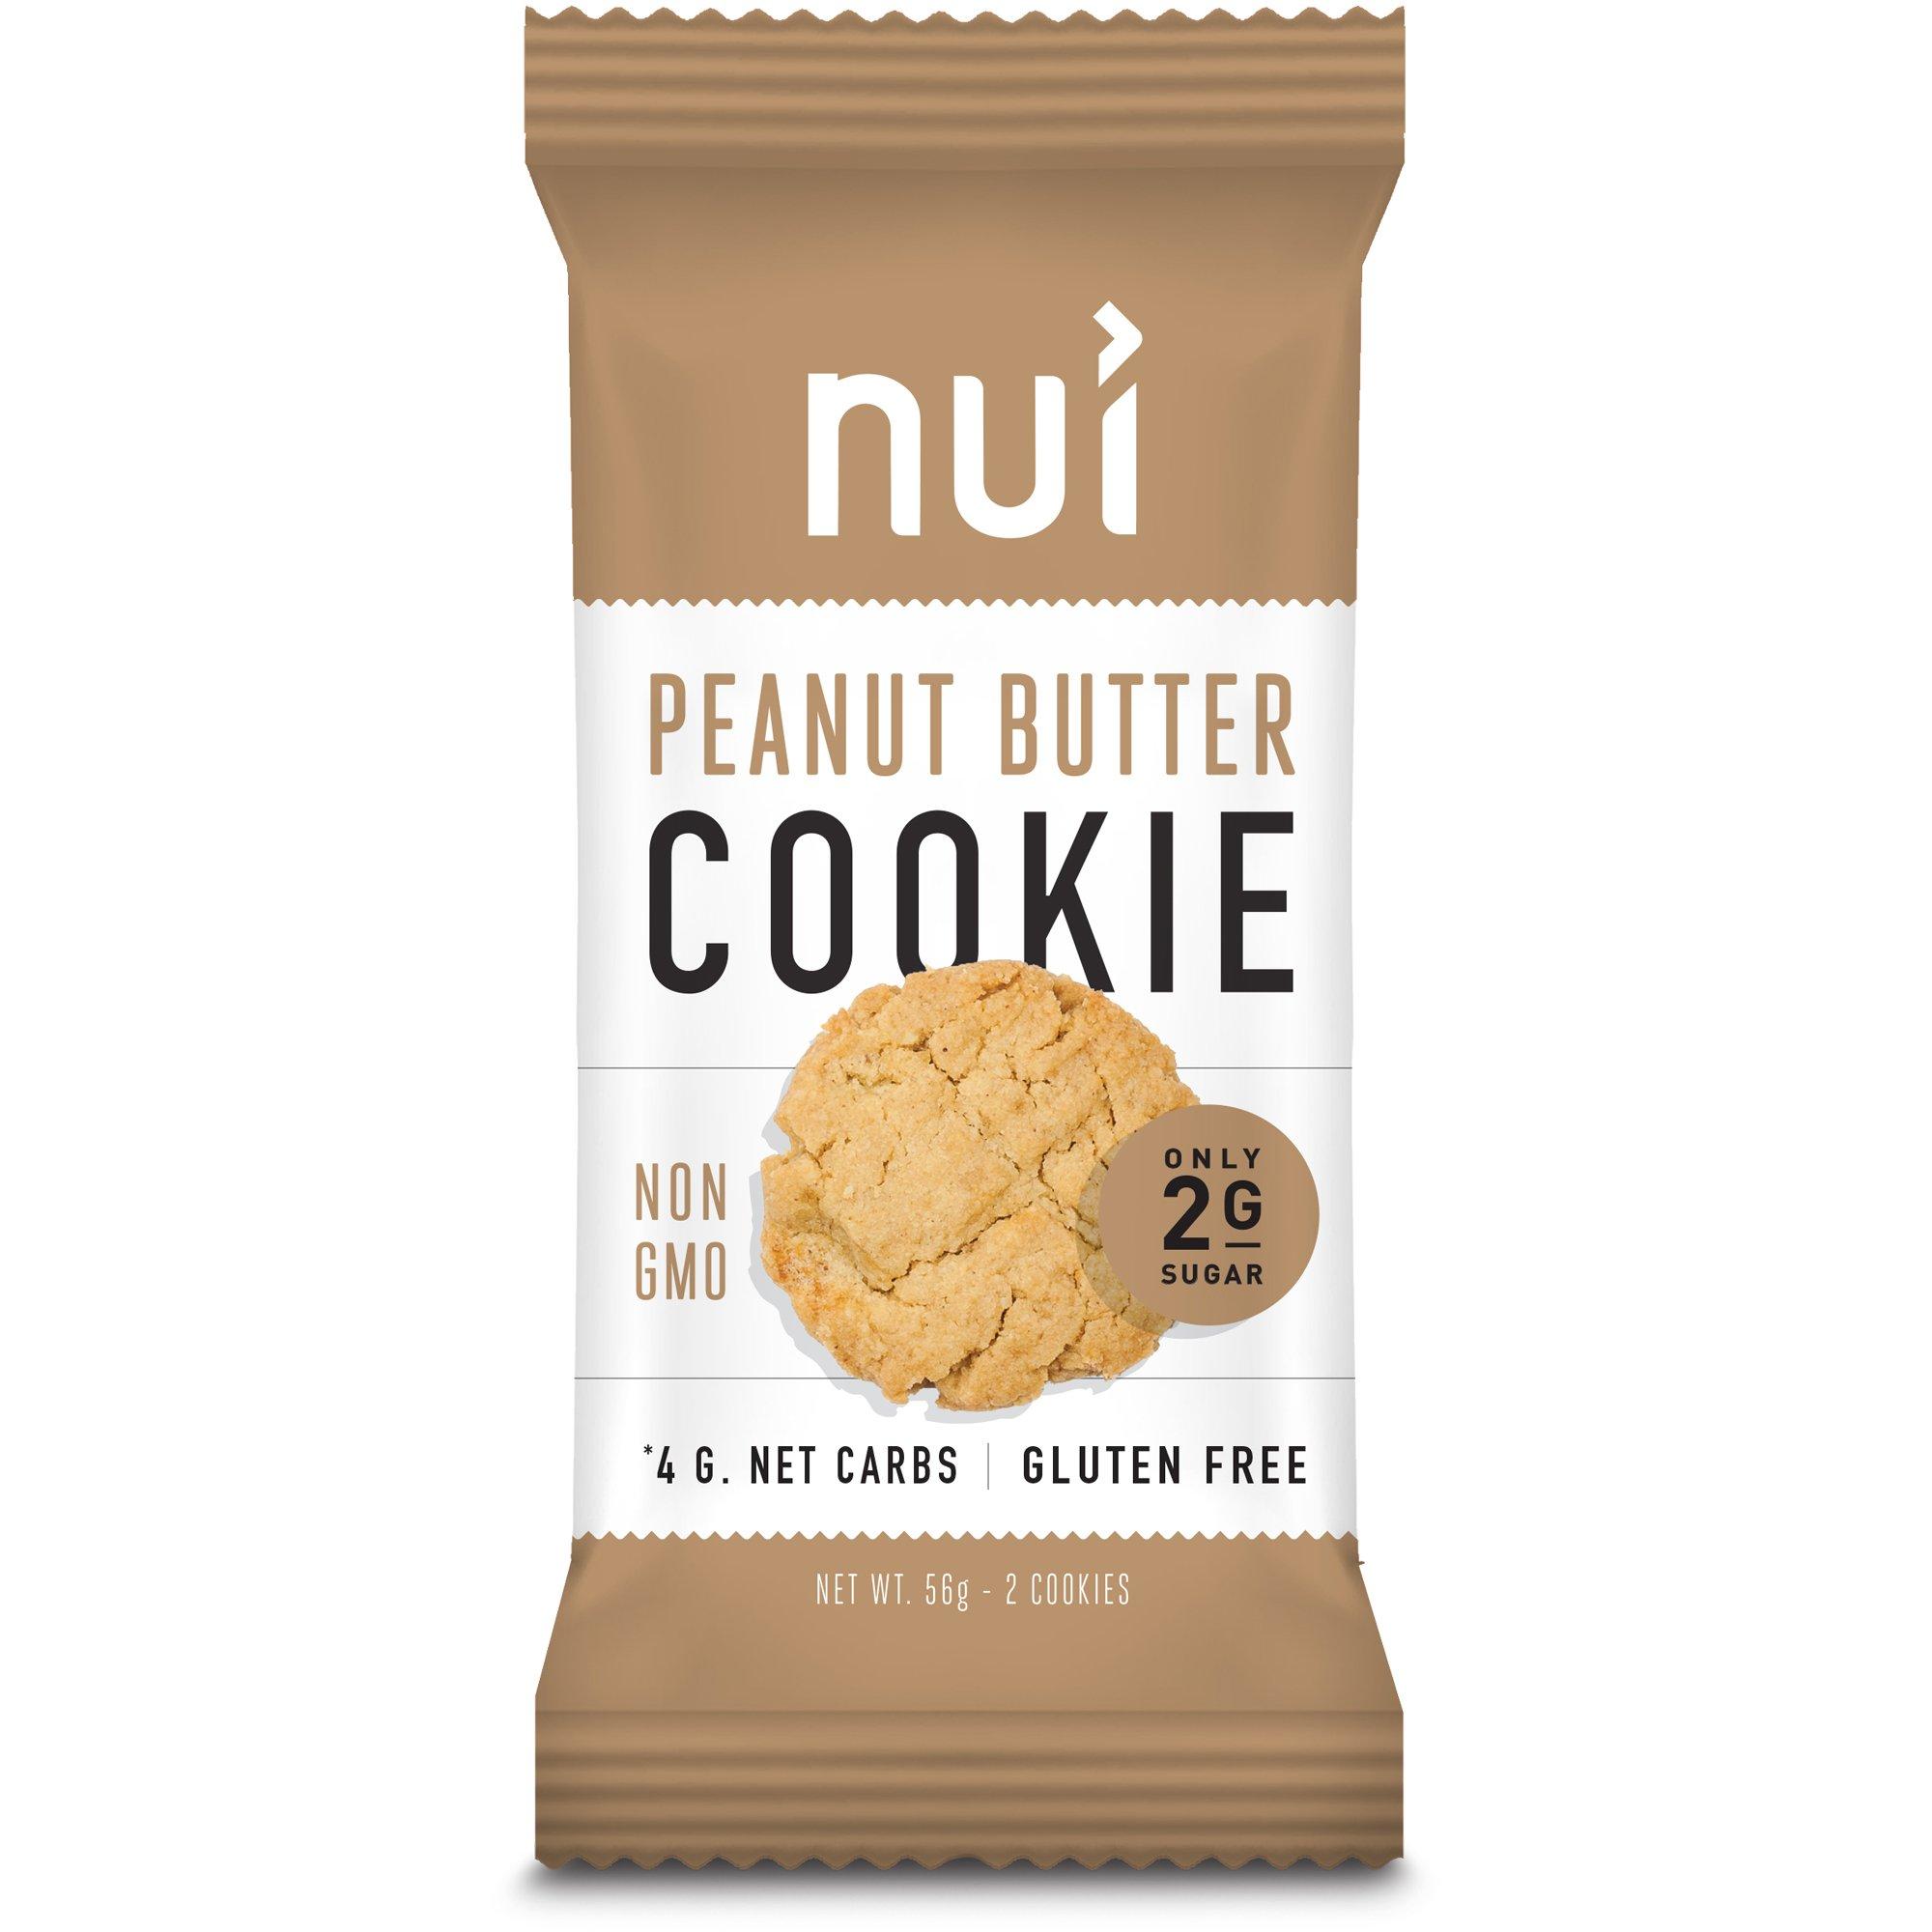 Keto Cookies, Low Carb Snacks: Peanut Butter Cookies by Nui - Keto Snacks, Low Carb, Low Sugar, 4g Net Carbs, Gluten Free - 8 Pack (16 cookies)